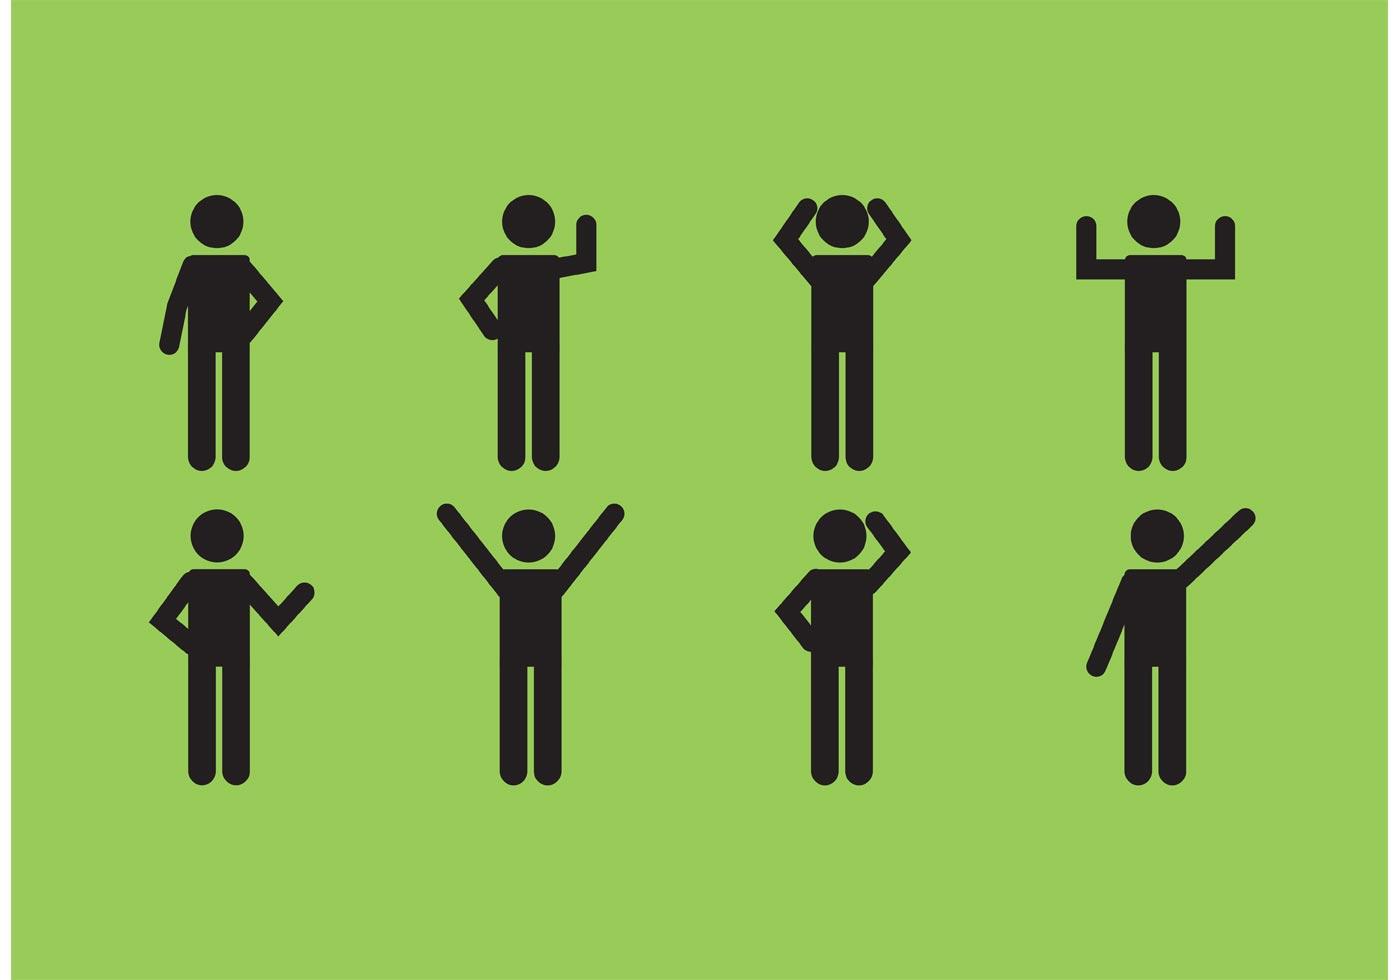 male stick figure icon set download free vector art stock rh vecteezy com vector graphics stick figure vector stick figure walking